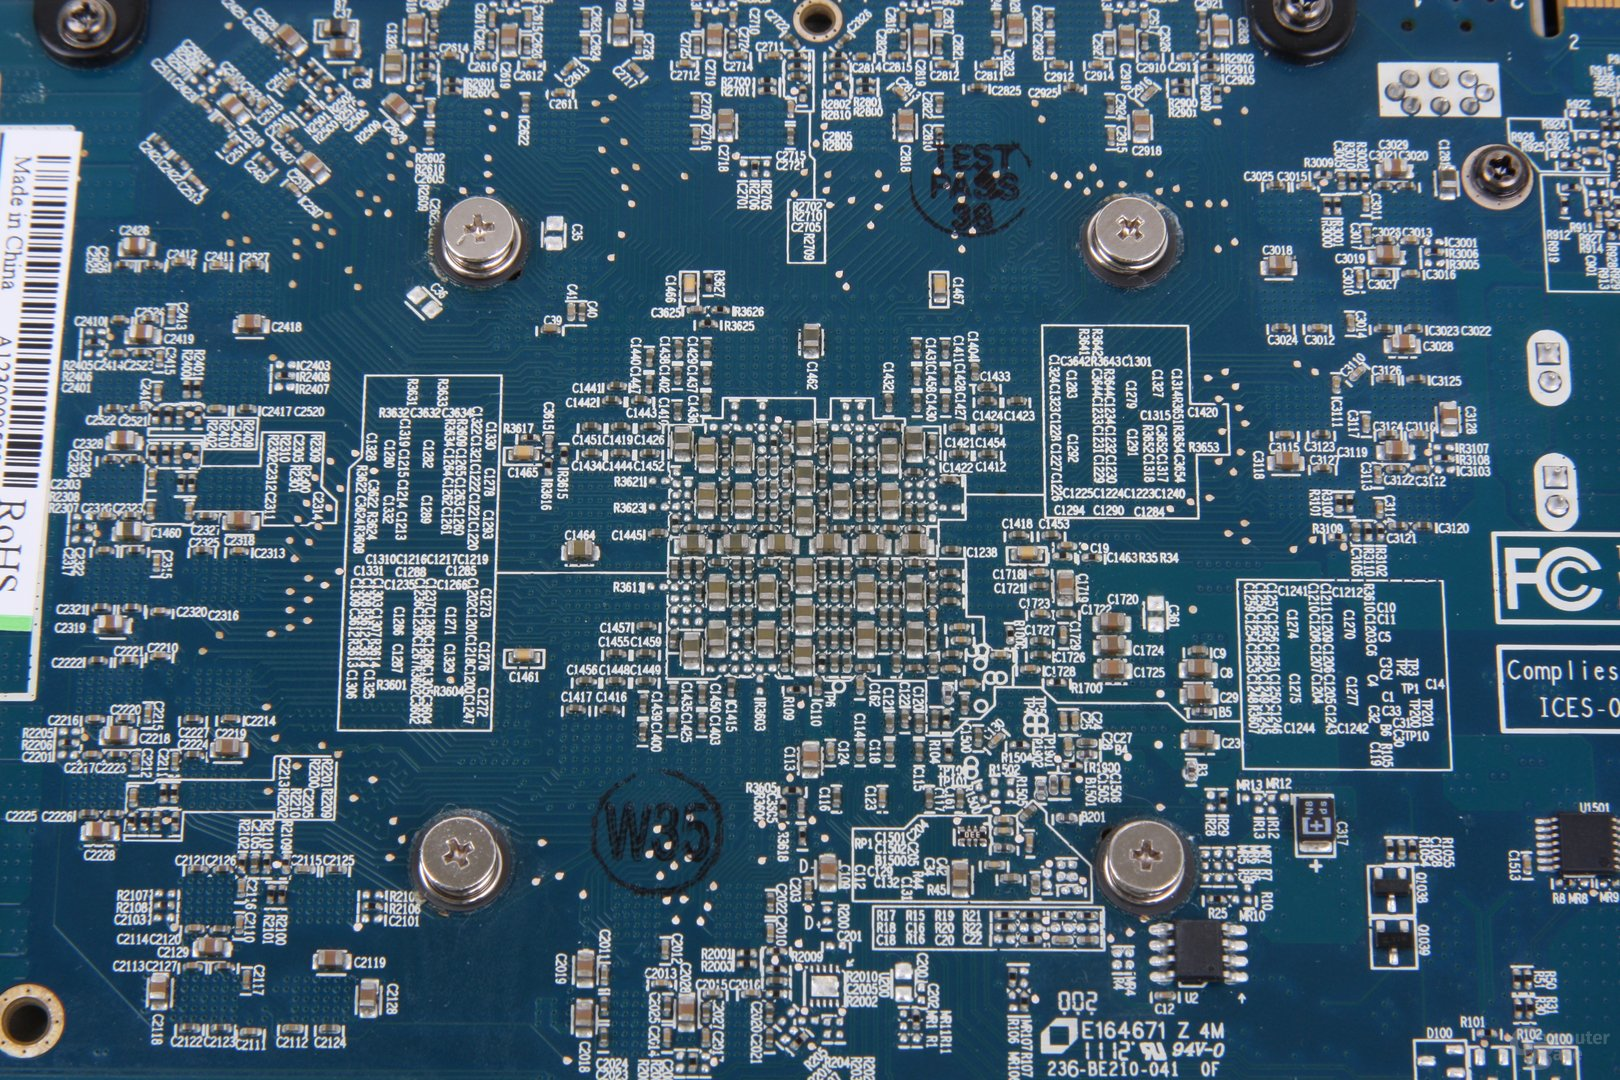 Radeon HD 7970 GHz Edition Vapor-X GPU-Rückseite